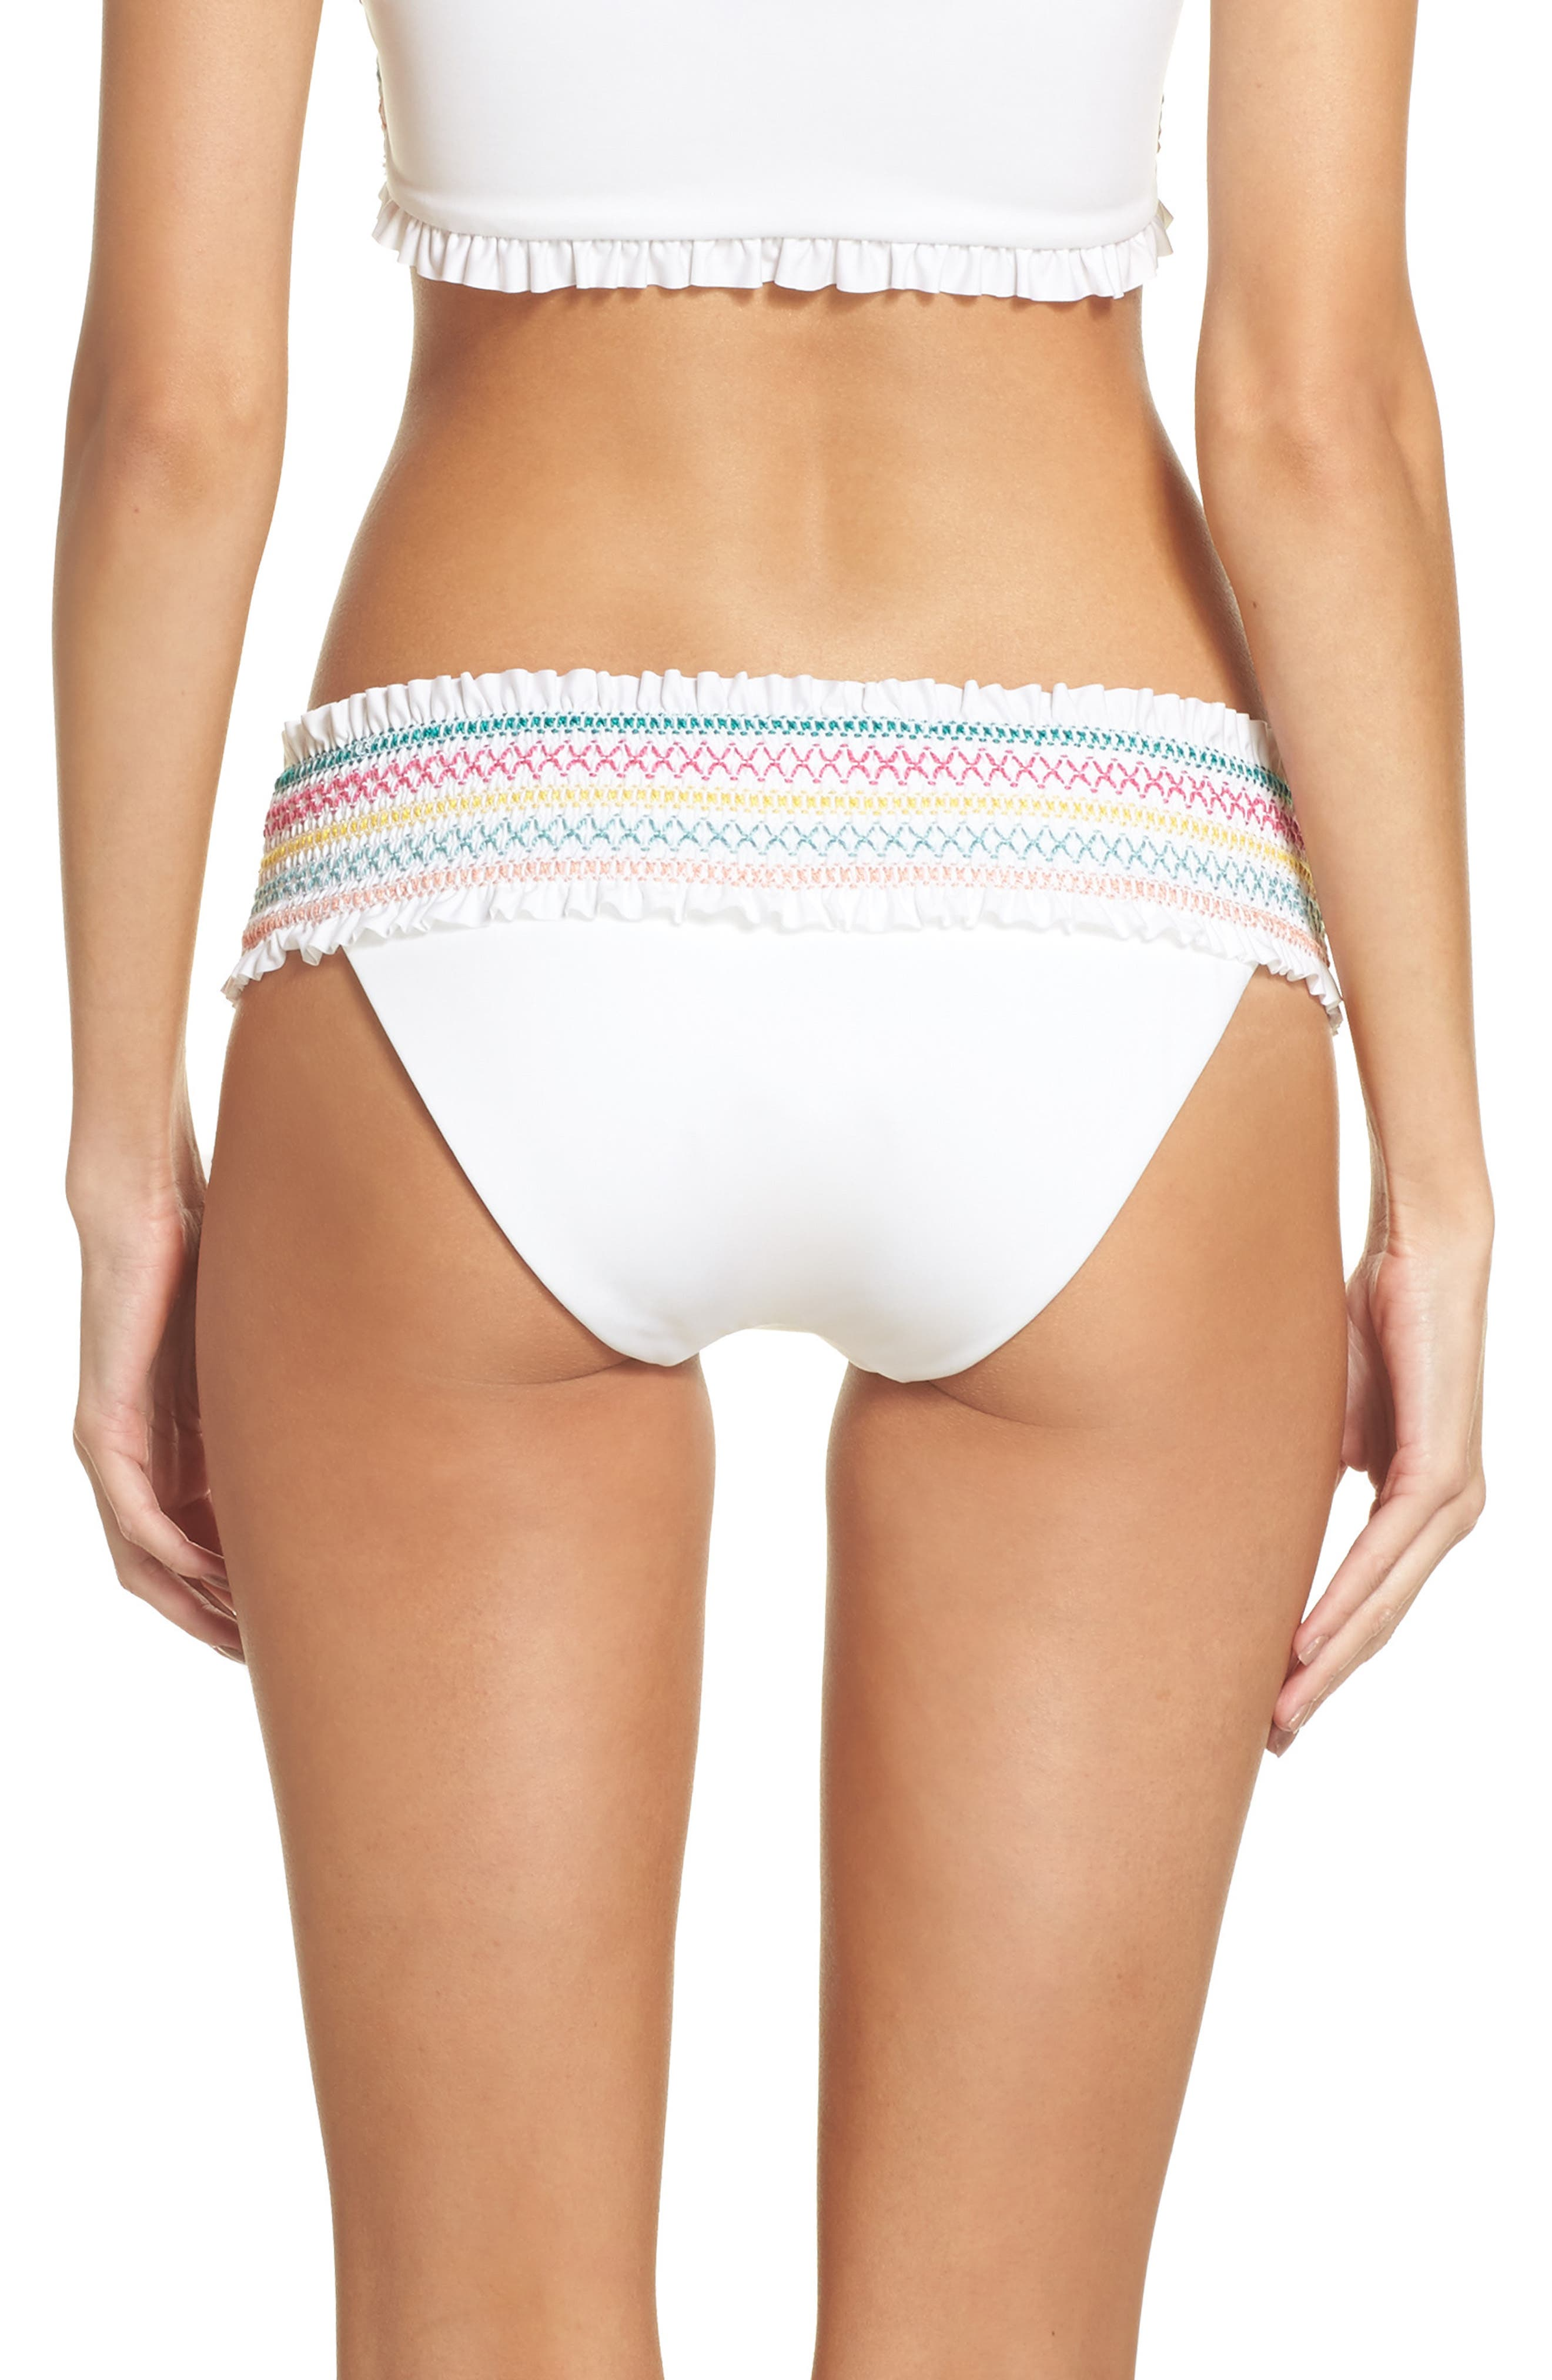 Crystal Cove Smocked Bikini Bottoms,                             Alternate thumbnail 2, color,                             100